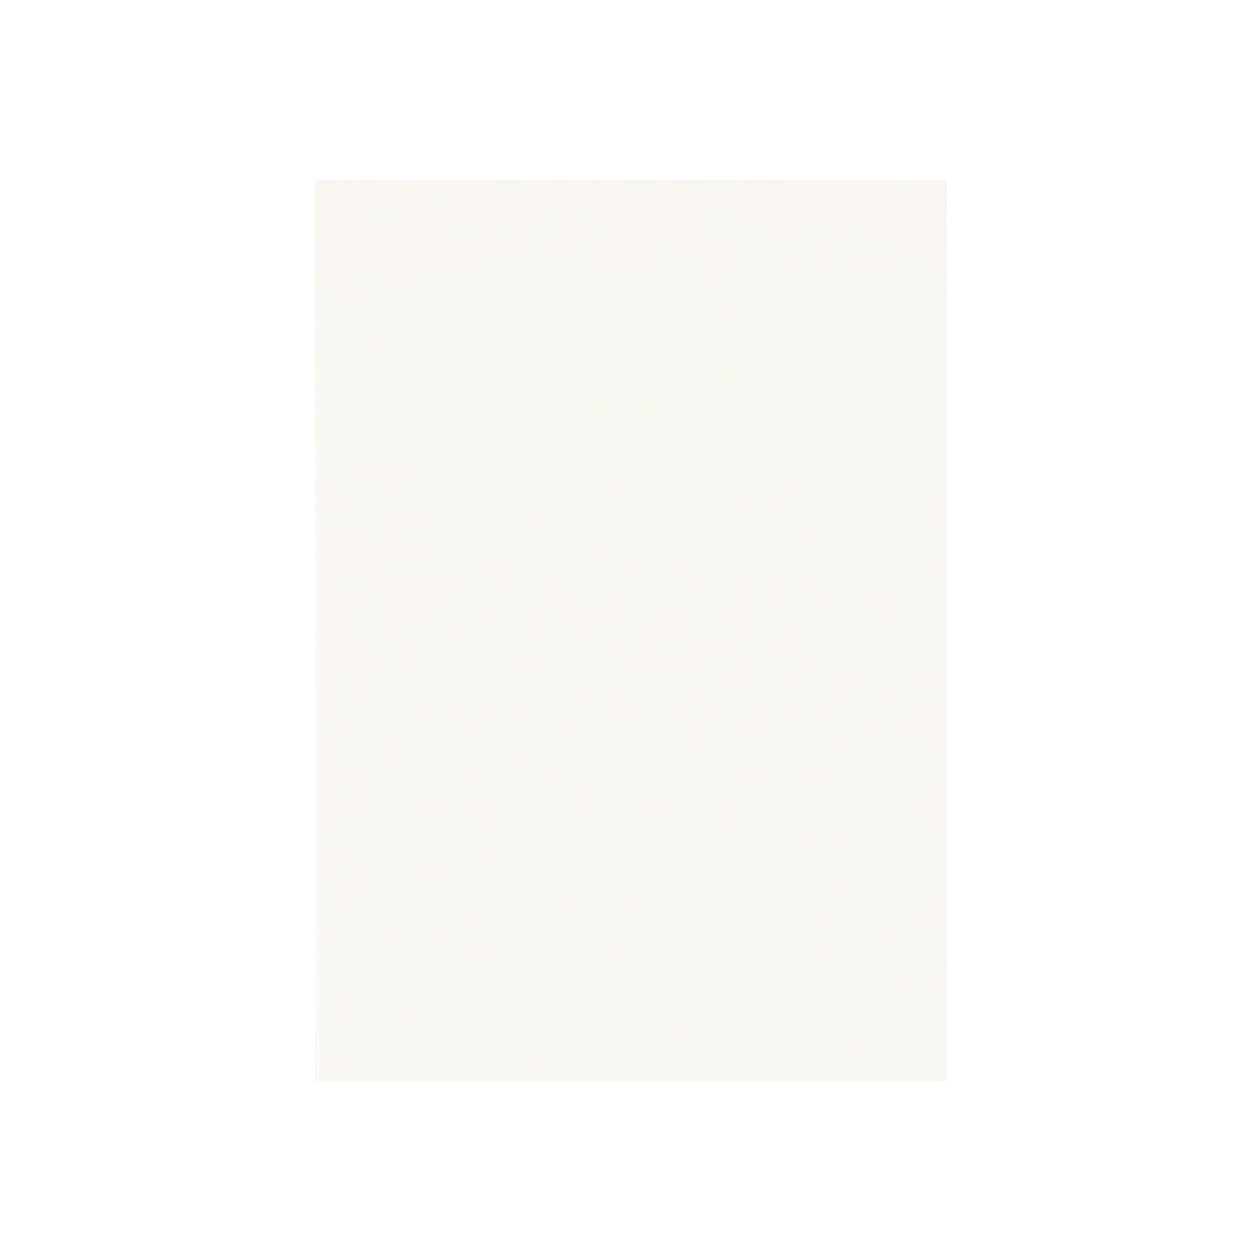 Pカード HAGURUMA Basic ソフトクリーム 260g